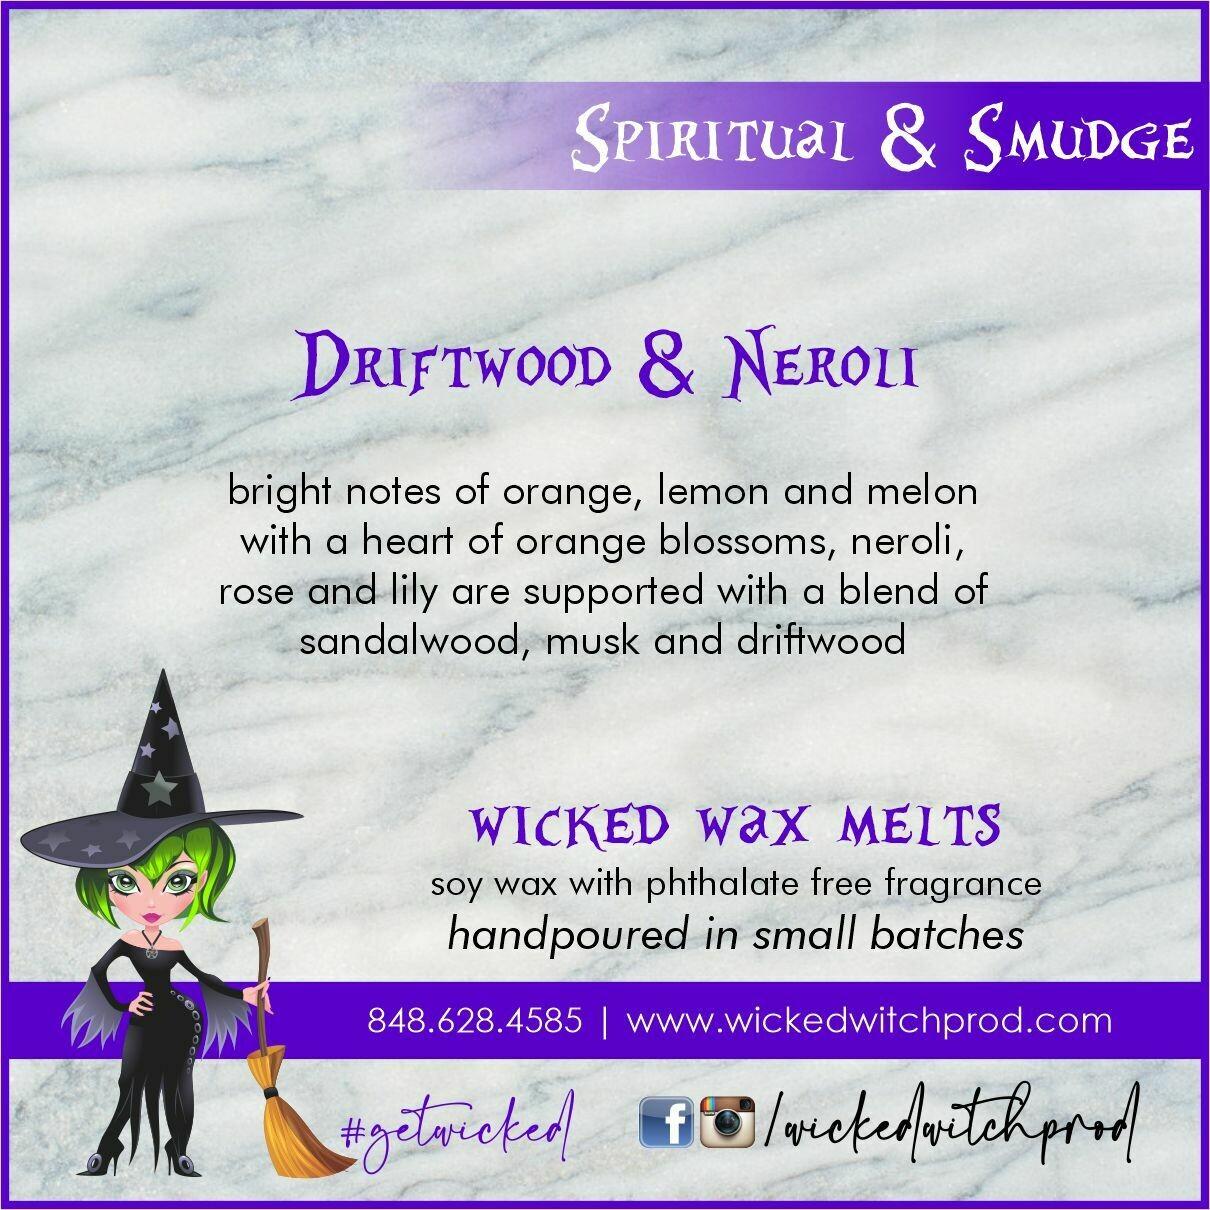 Driftwood & Neroli Wicked Wax Melts